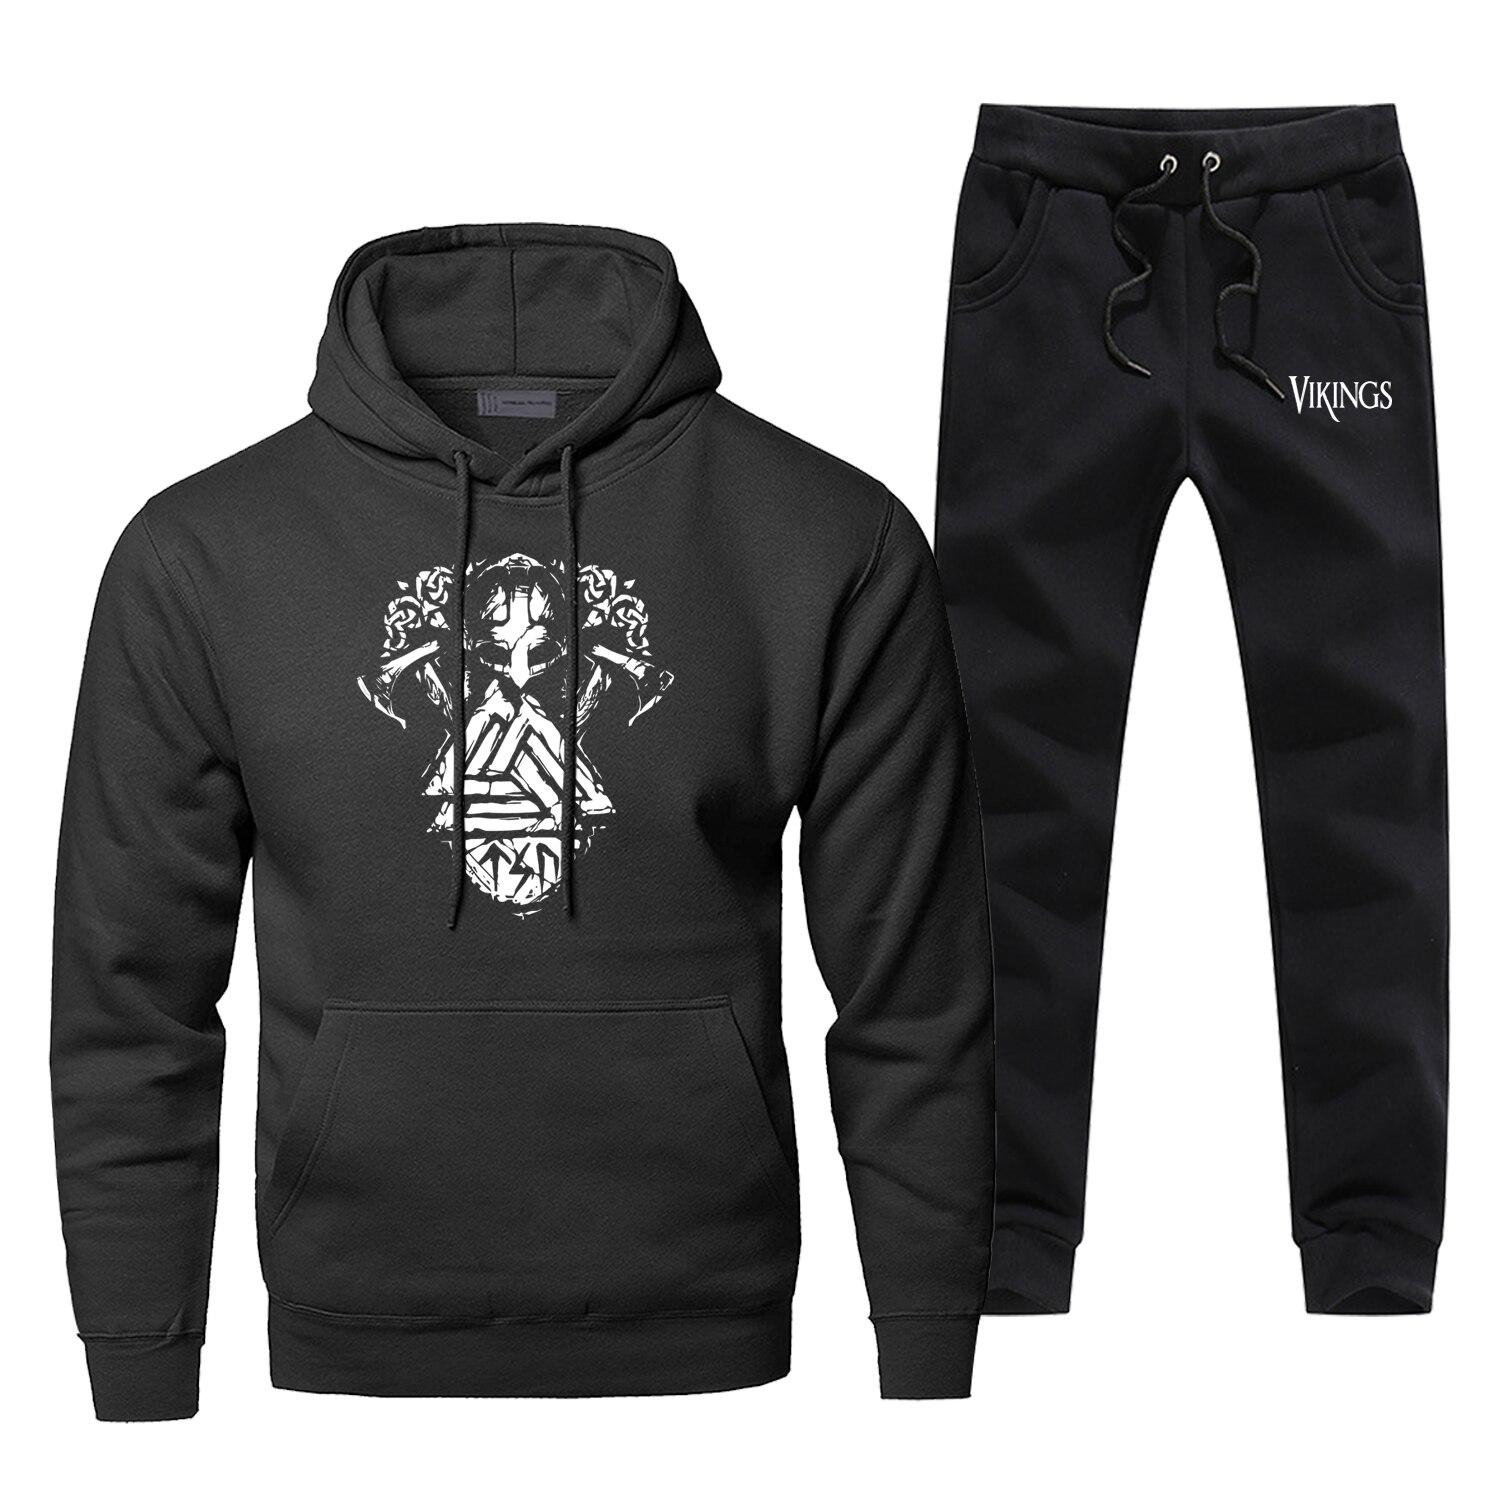 Tv Show Odin Viking Sweatshirt Men Vikings Symbols Hoodie Pants Sets Men Casual Sportswear Fashion Winter Harajuku Streetwear